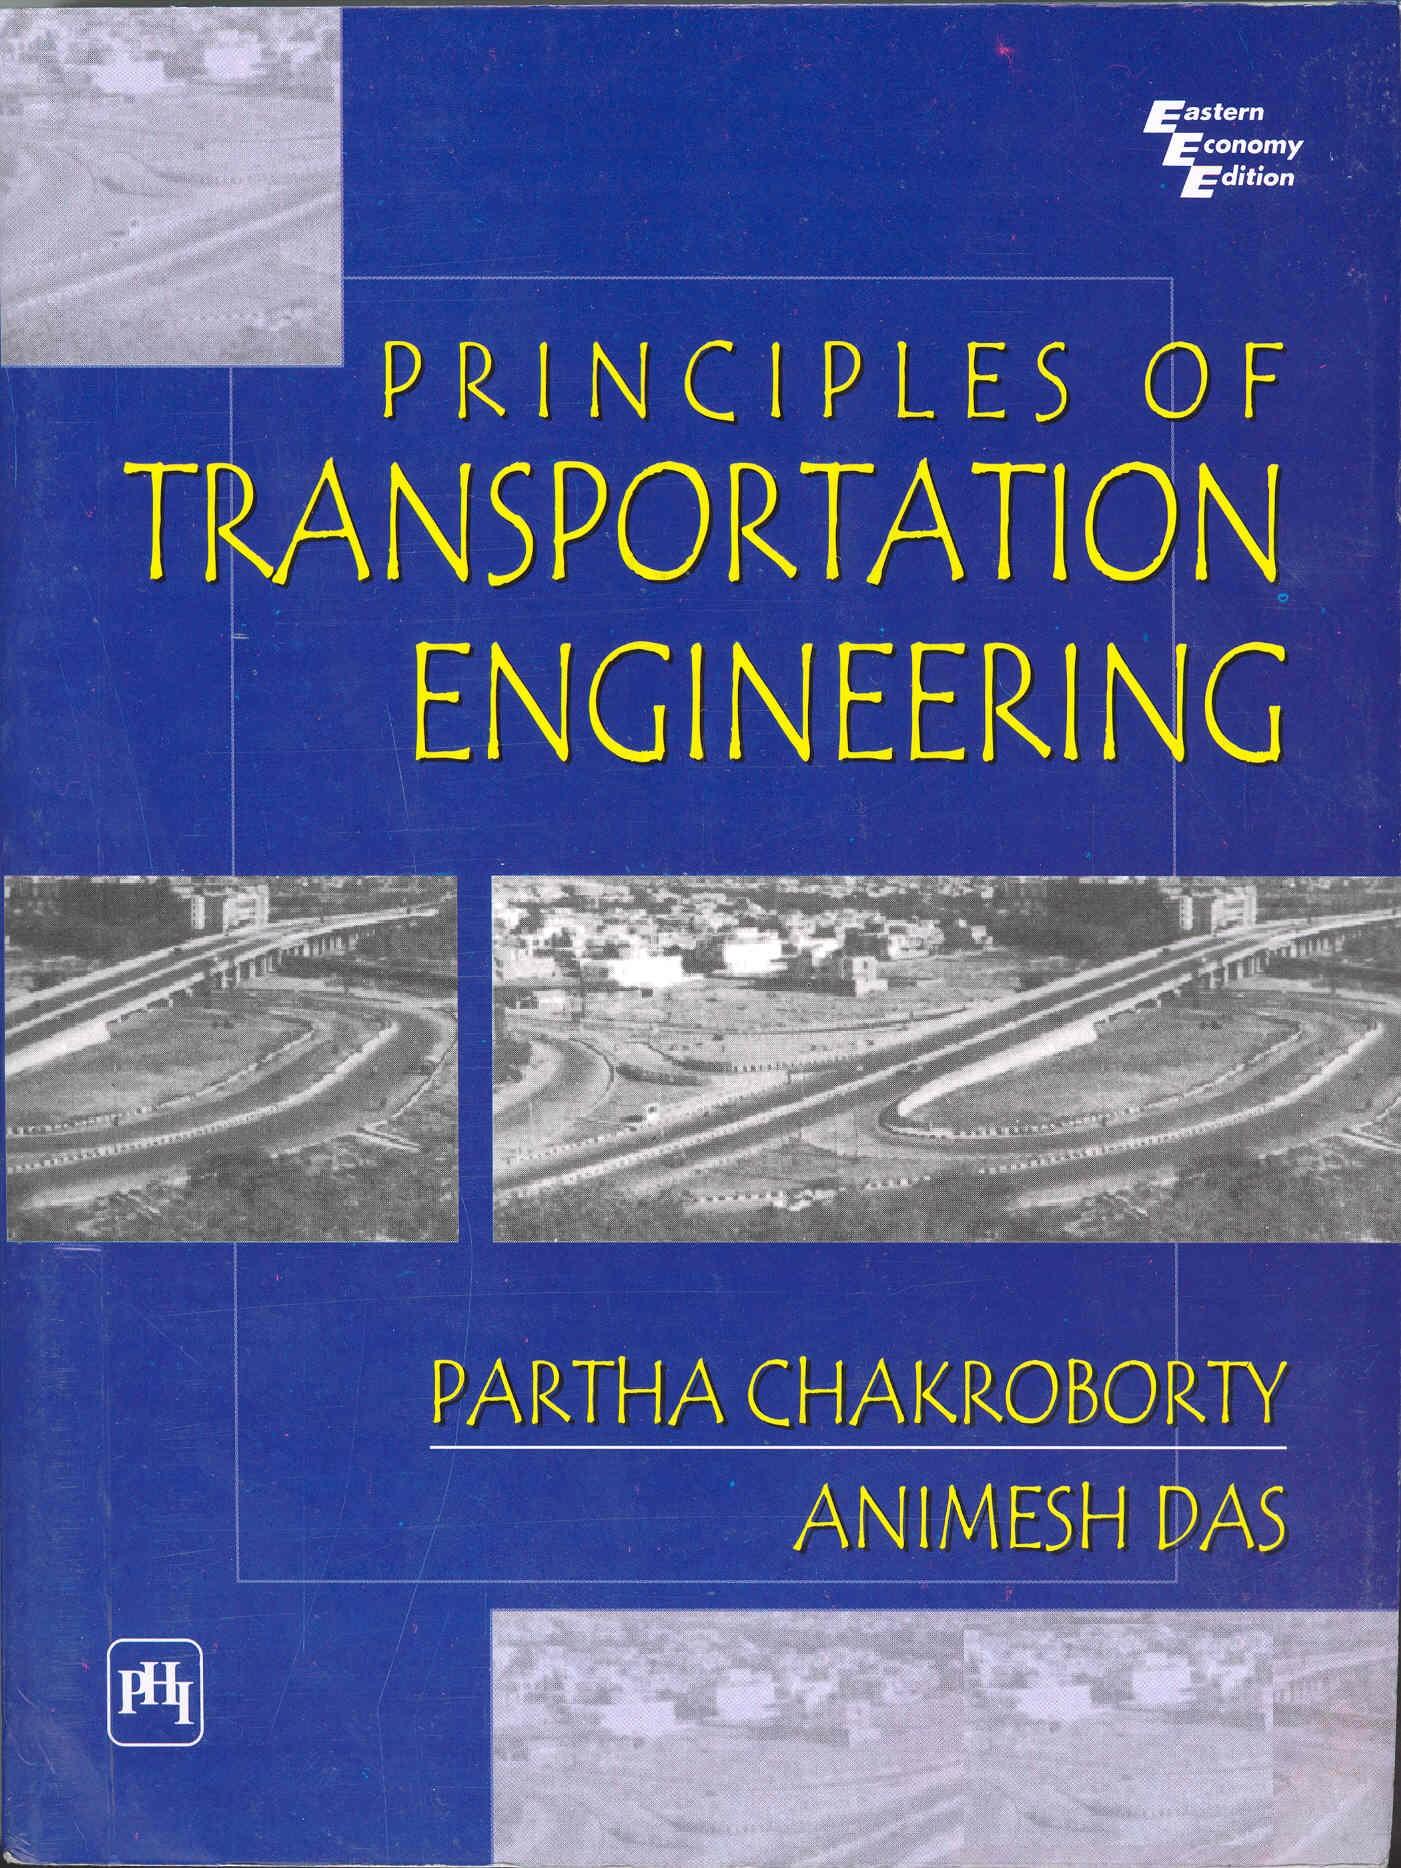 Partha Chakroborty Professor Ce Iit Kanpur